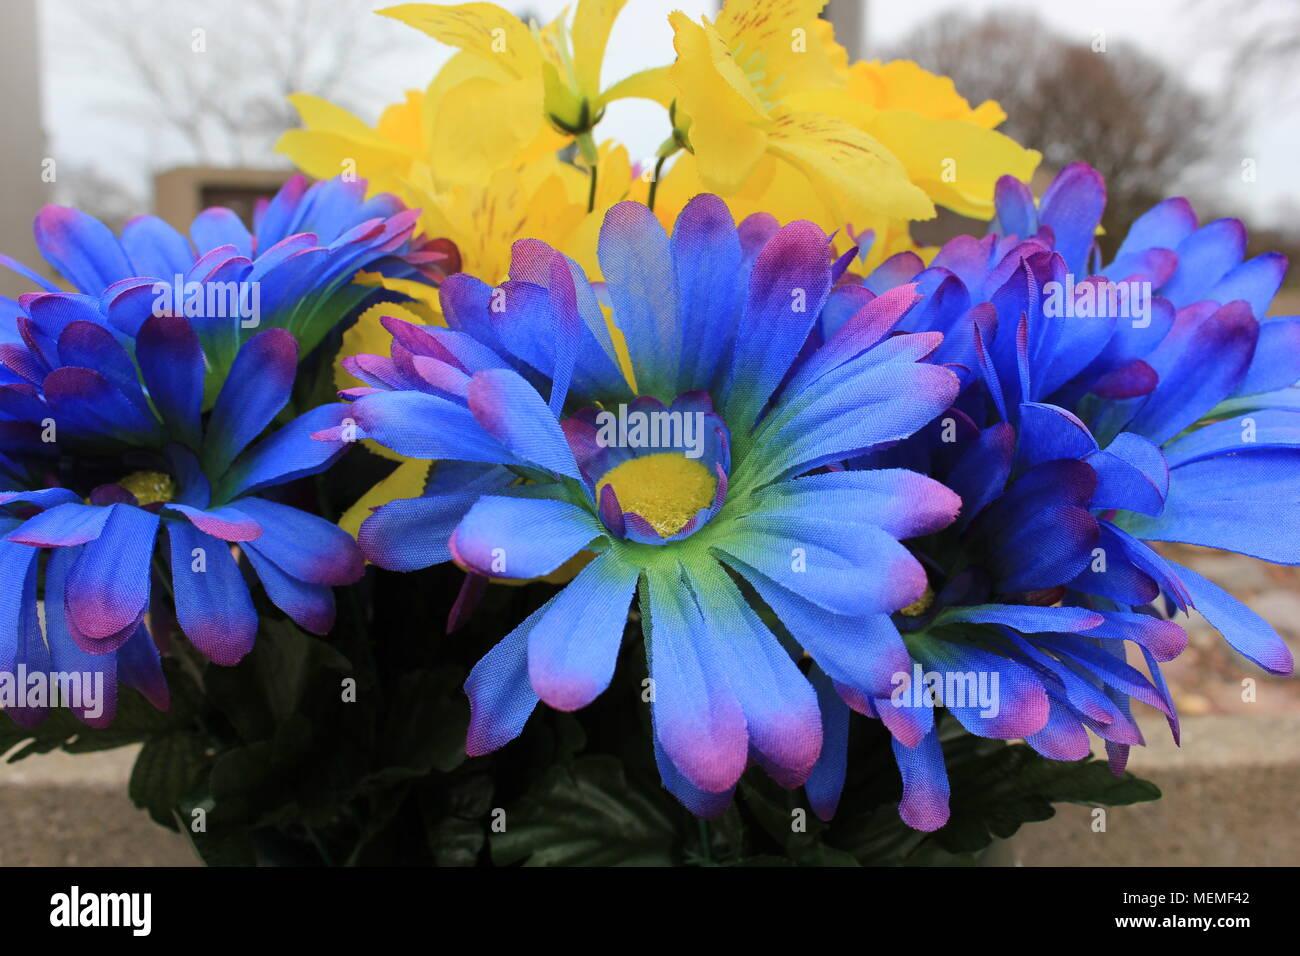 Bunch Of Everlasting Flowers Stock Photos Bunch Of Everlasting